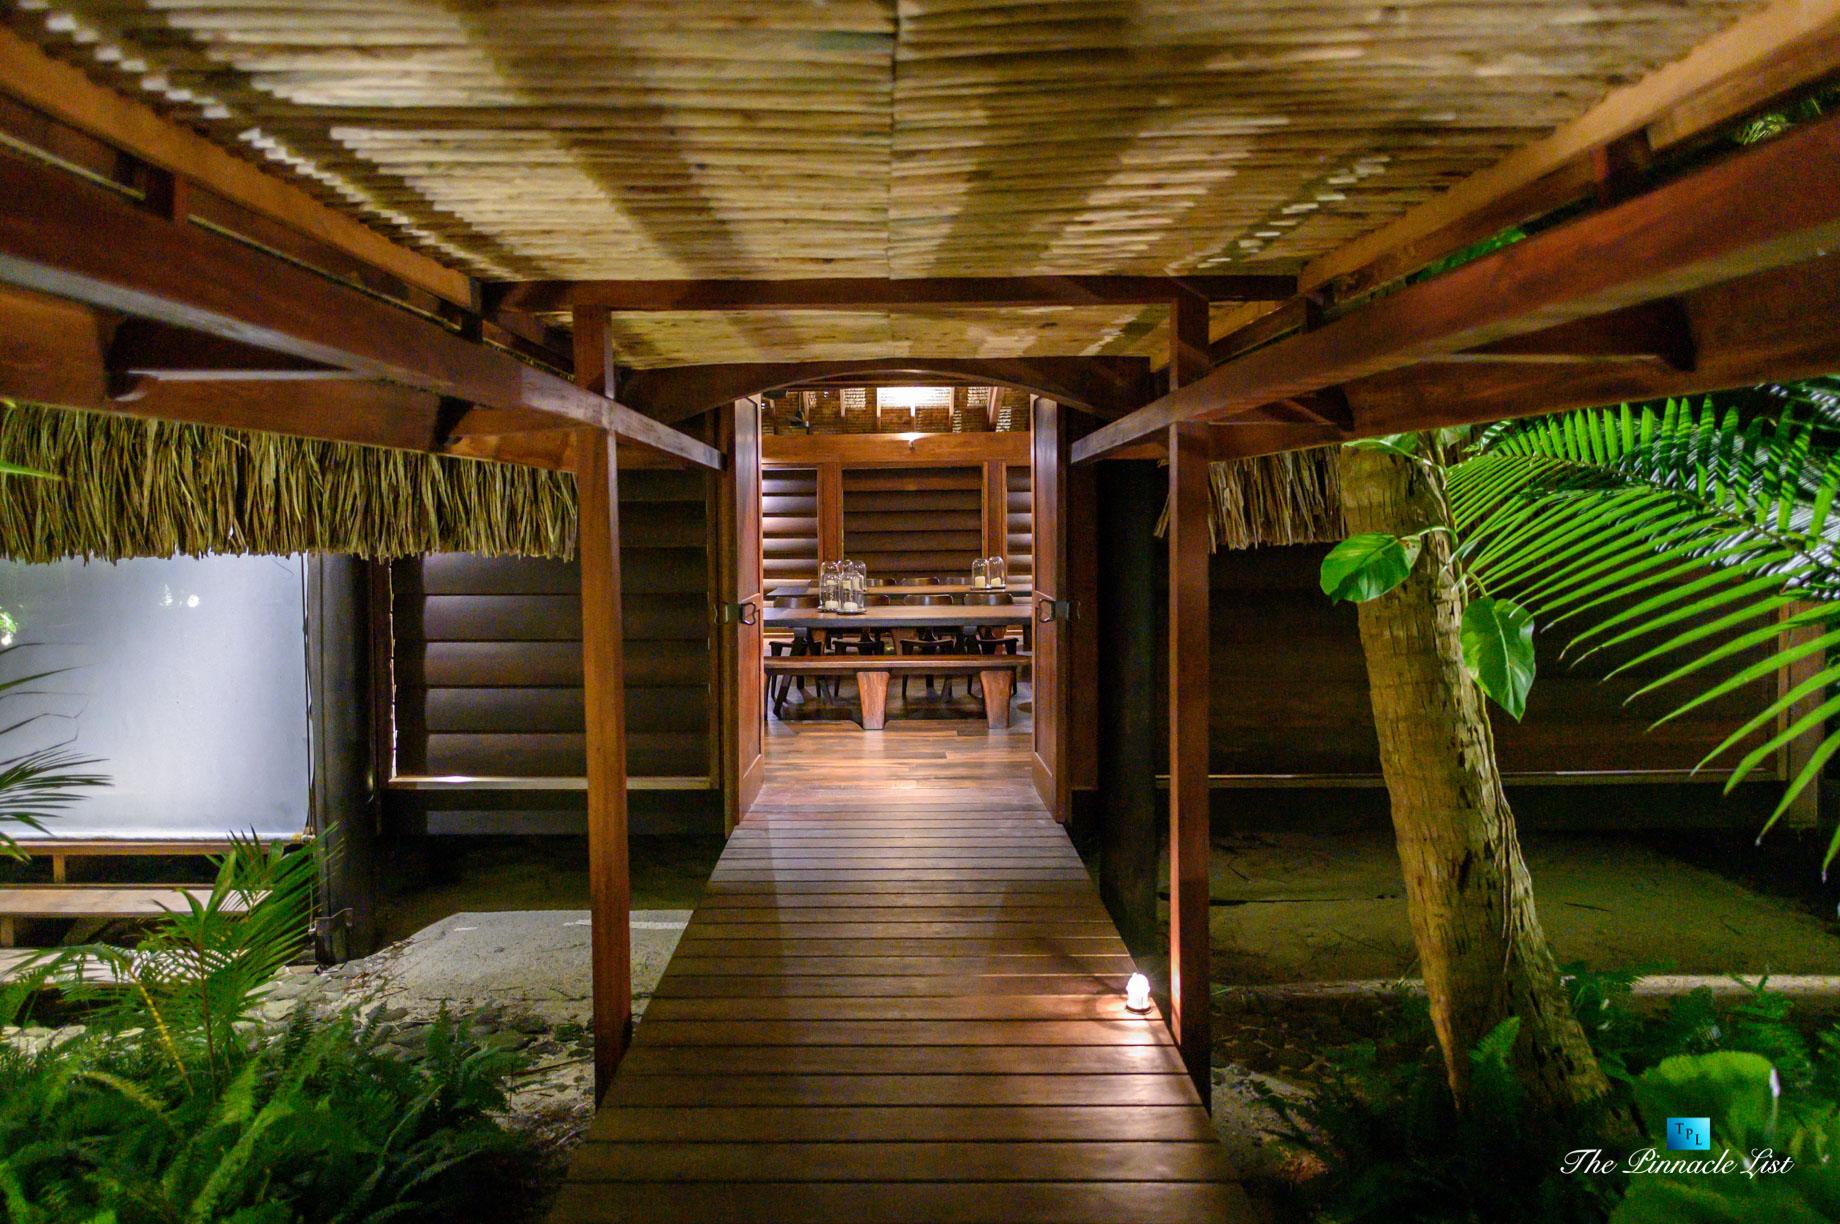 Motu Tane Private Island - Bora Bora, French Polynesia